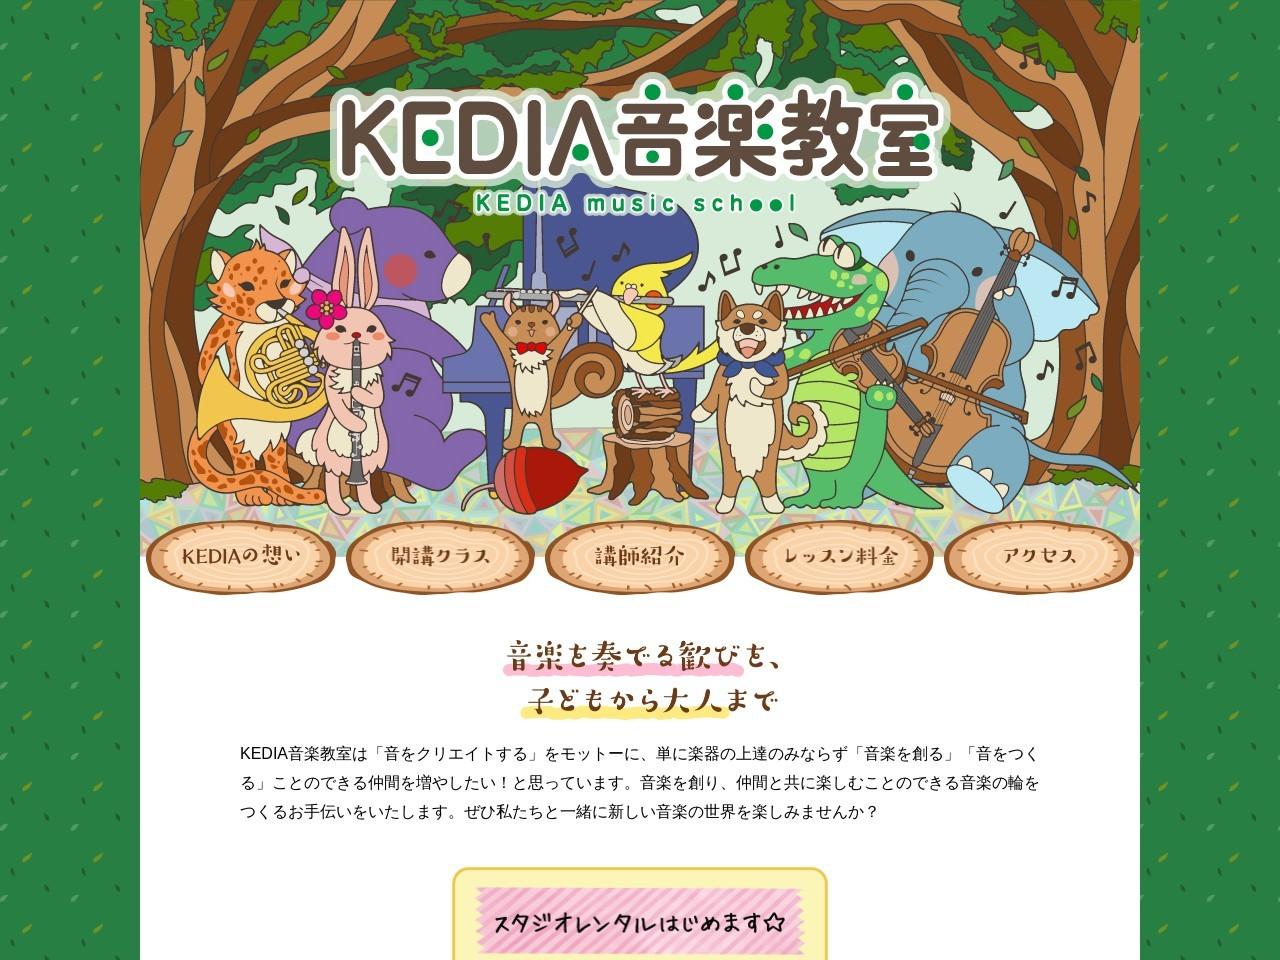 KEDIA音楽教室のサムネイル